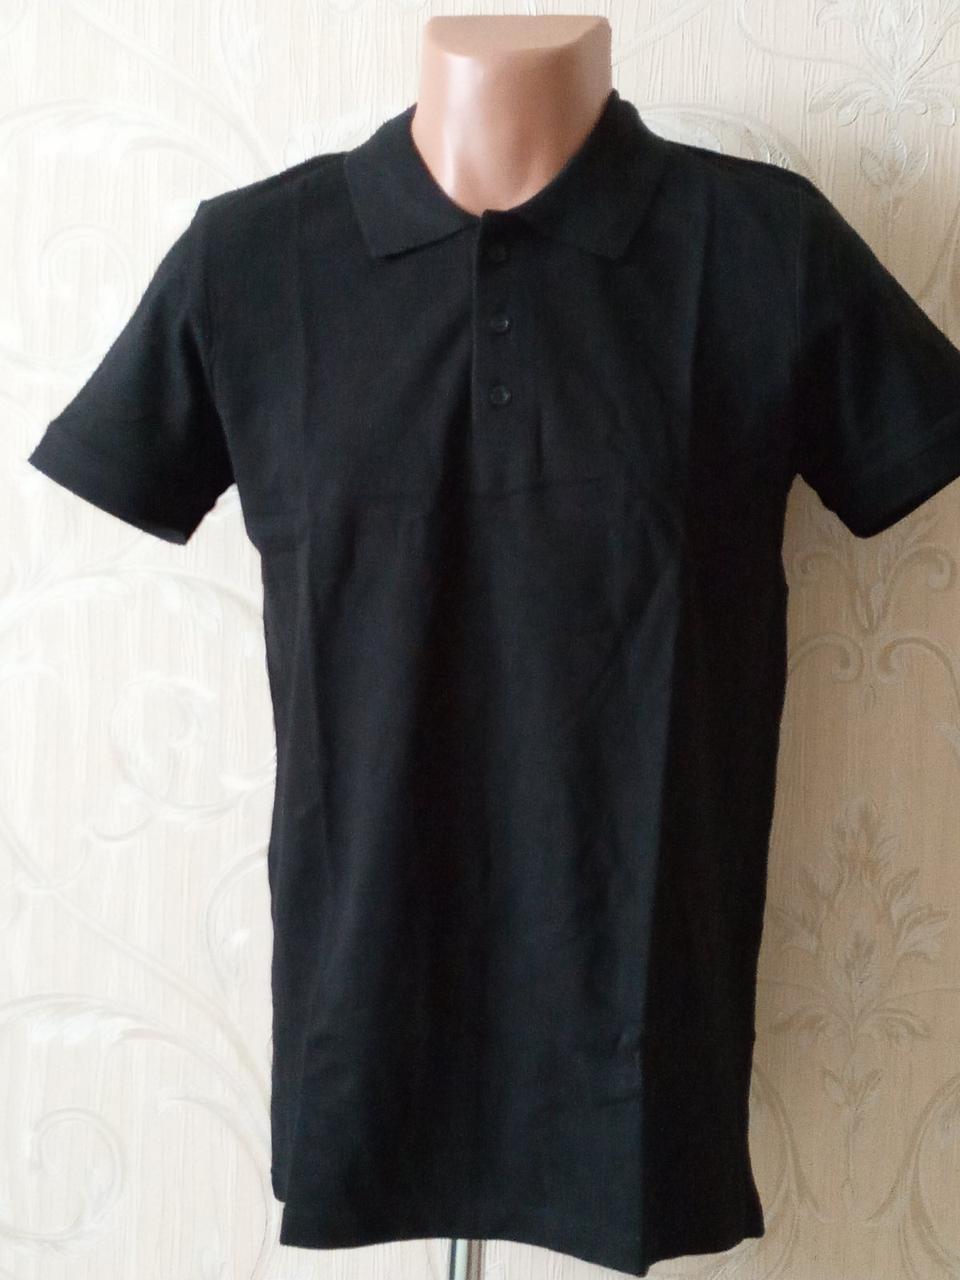 Футболка мужская поло с короткими рукавами 100% хлопок Узбекистан размер 2XL (52-54)